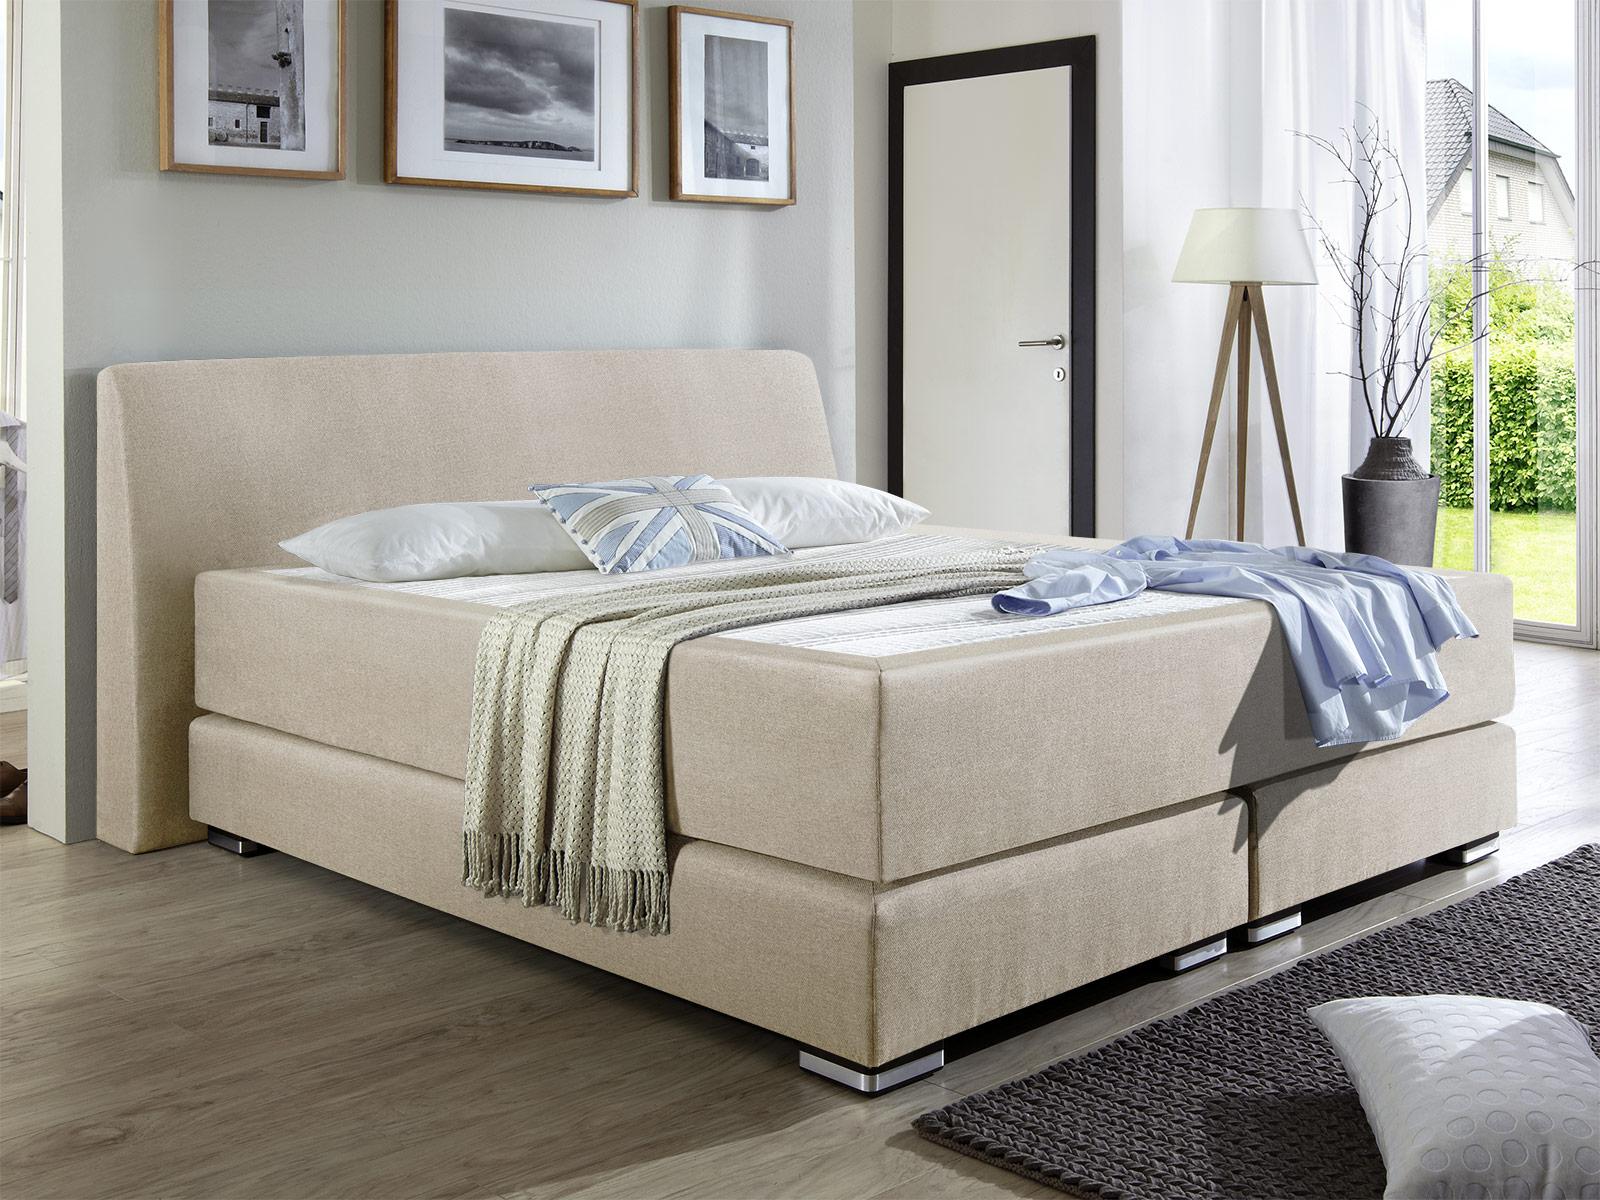 malie boxspringbett mit amerikanischem liegegef hl highland. Black Bedroom Furniture Sets. Home Design Ideas